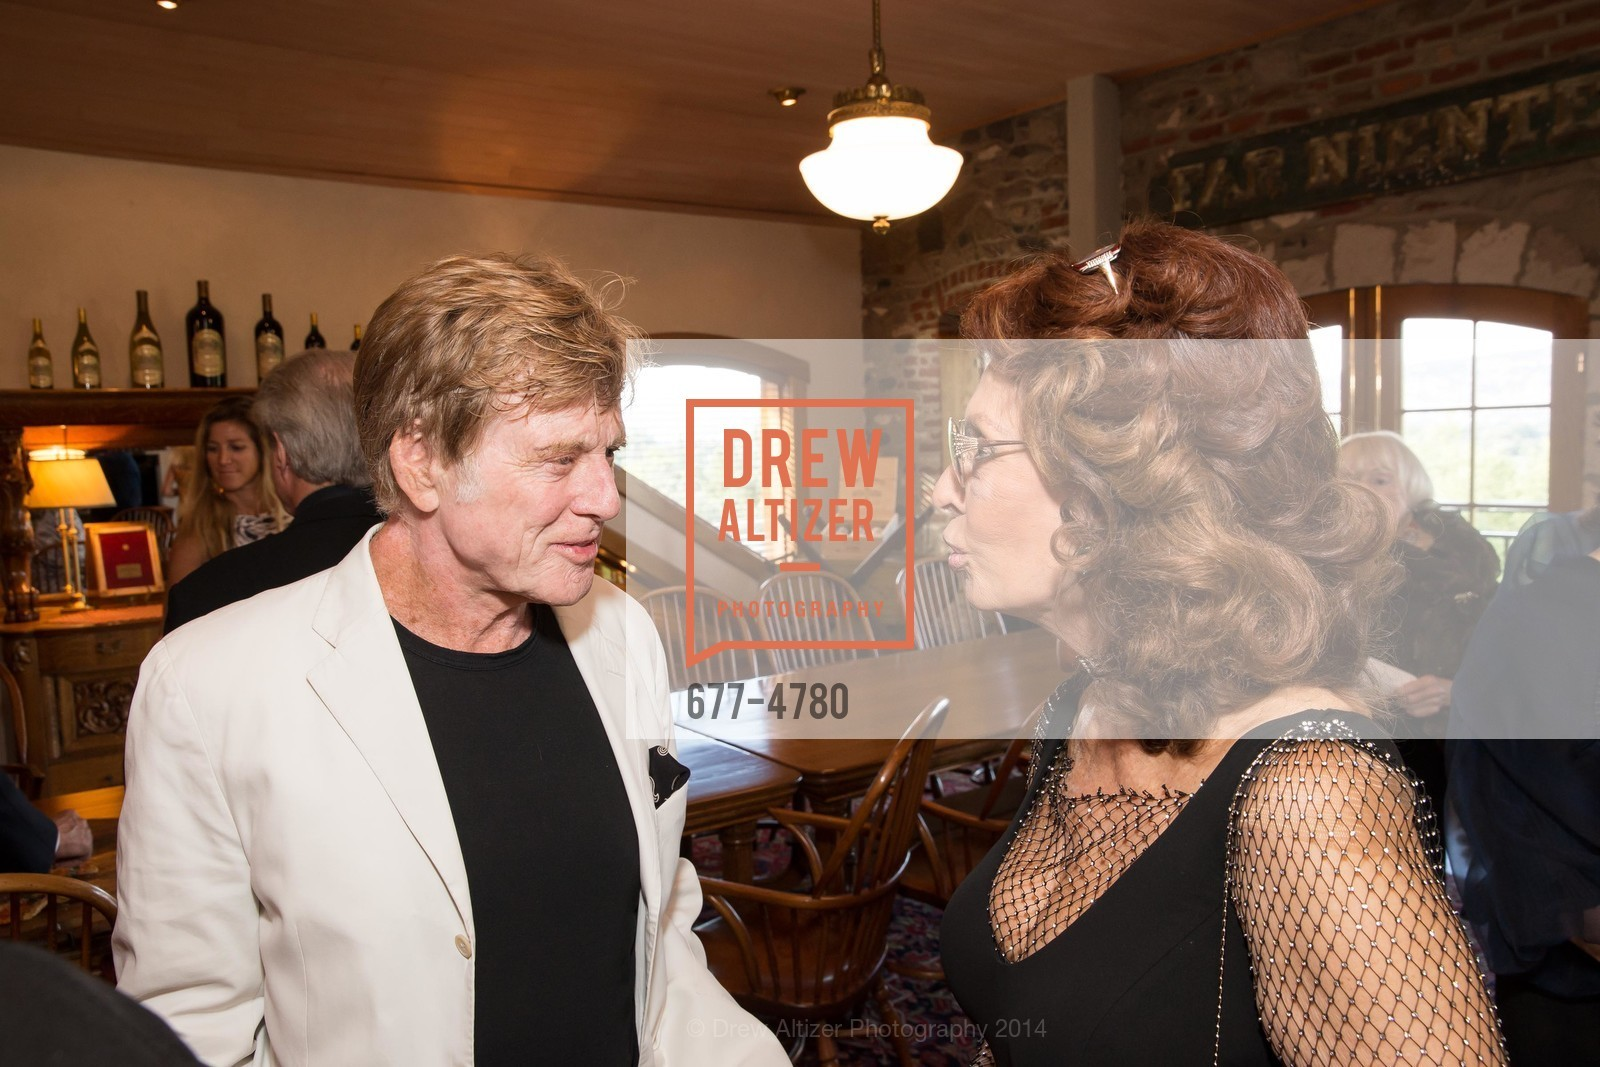 Robert Redford, Sophia Loren, Photo #677-4780